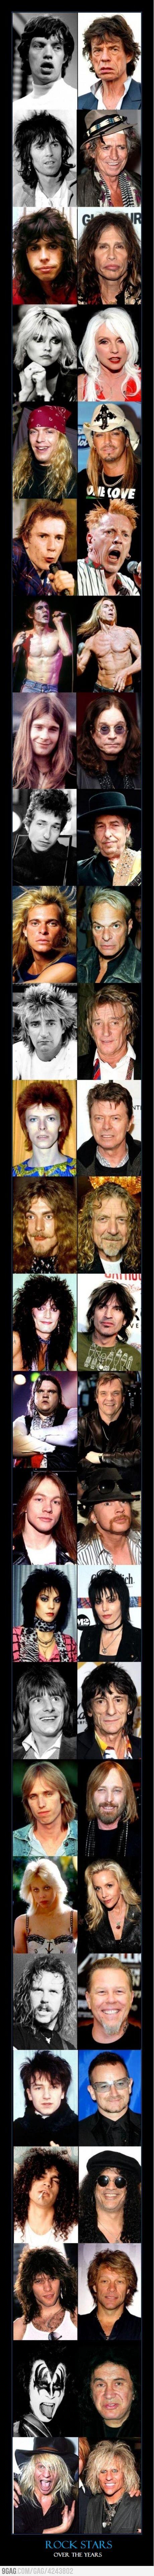 eh.: Jimmy Pages, Then And Now, Joan Jett, Age Timeline, Jon Bon Jovi, Rocks Stars, Rock Stars, Biz Stuff, Rocks Of Age